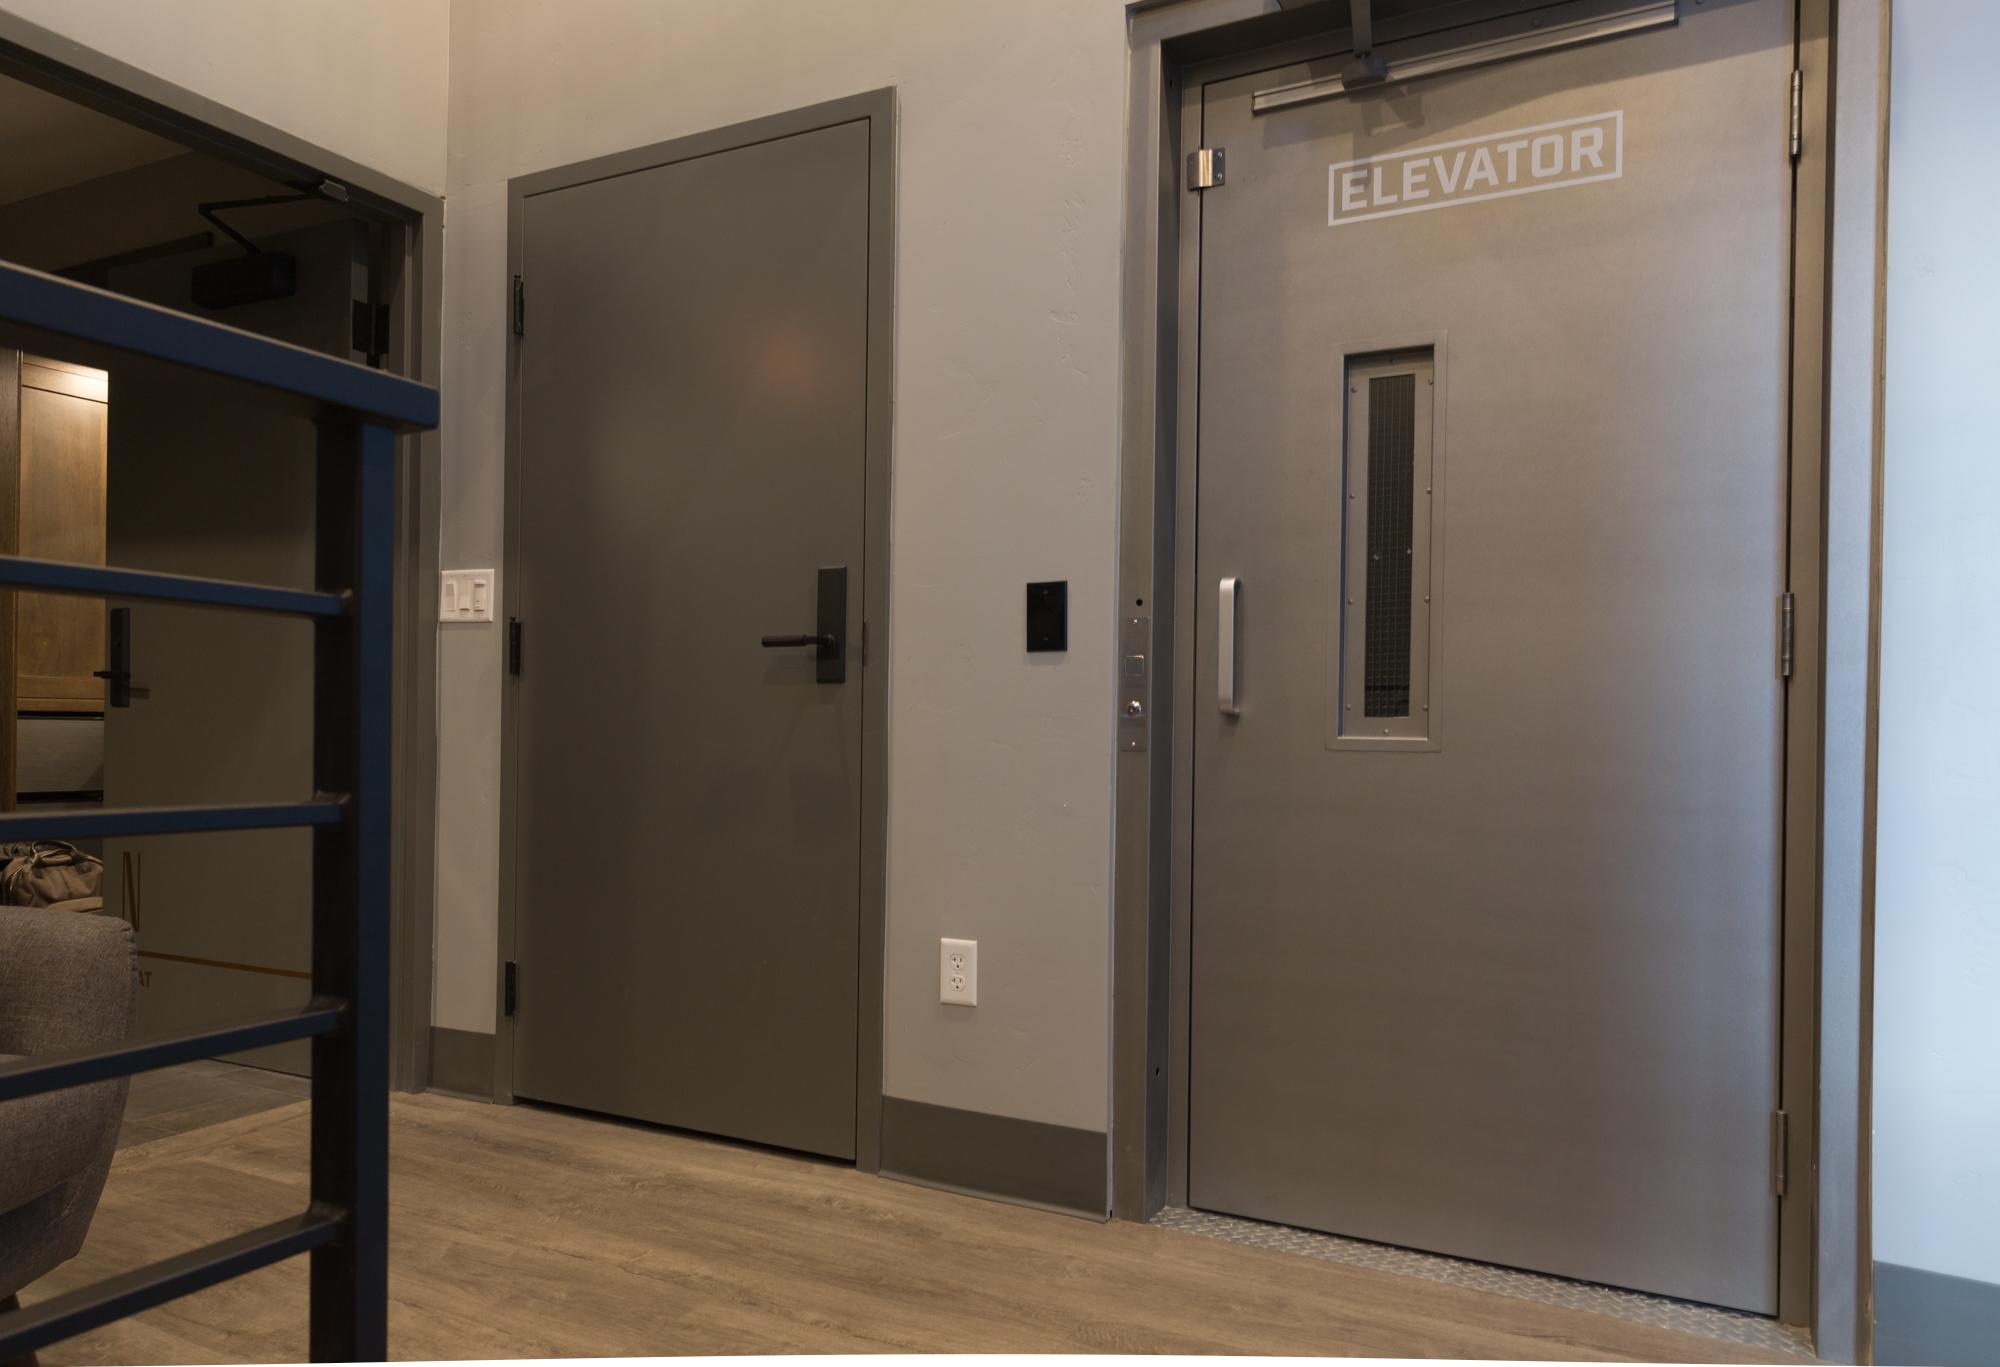 FlatsLuxurySuites_Elevator_22EastCenter2.jpg